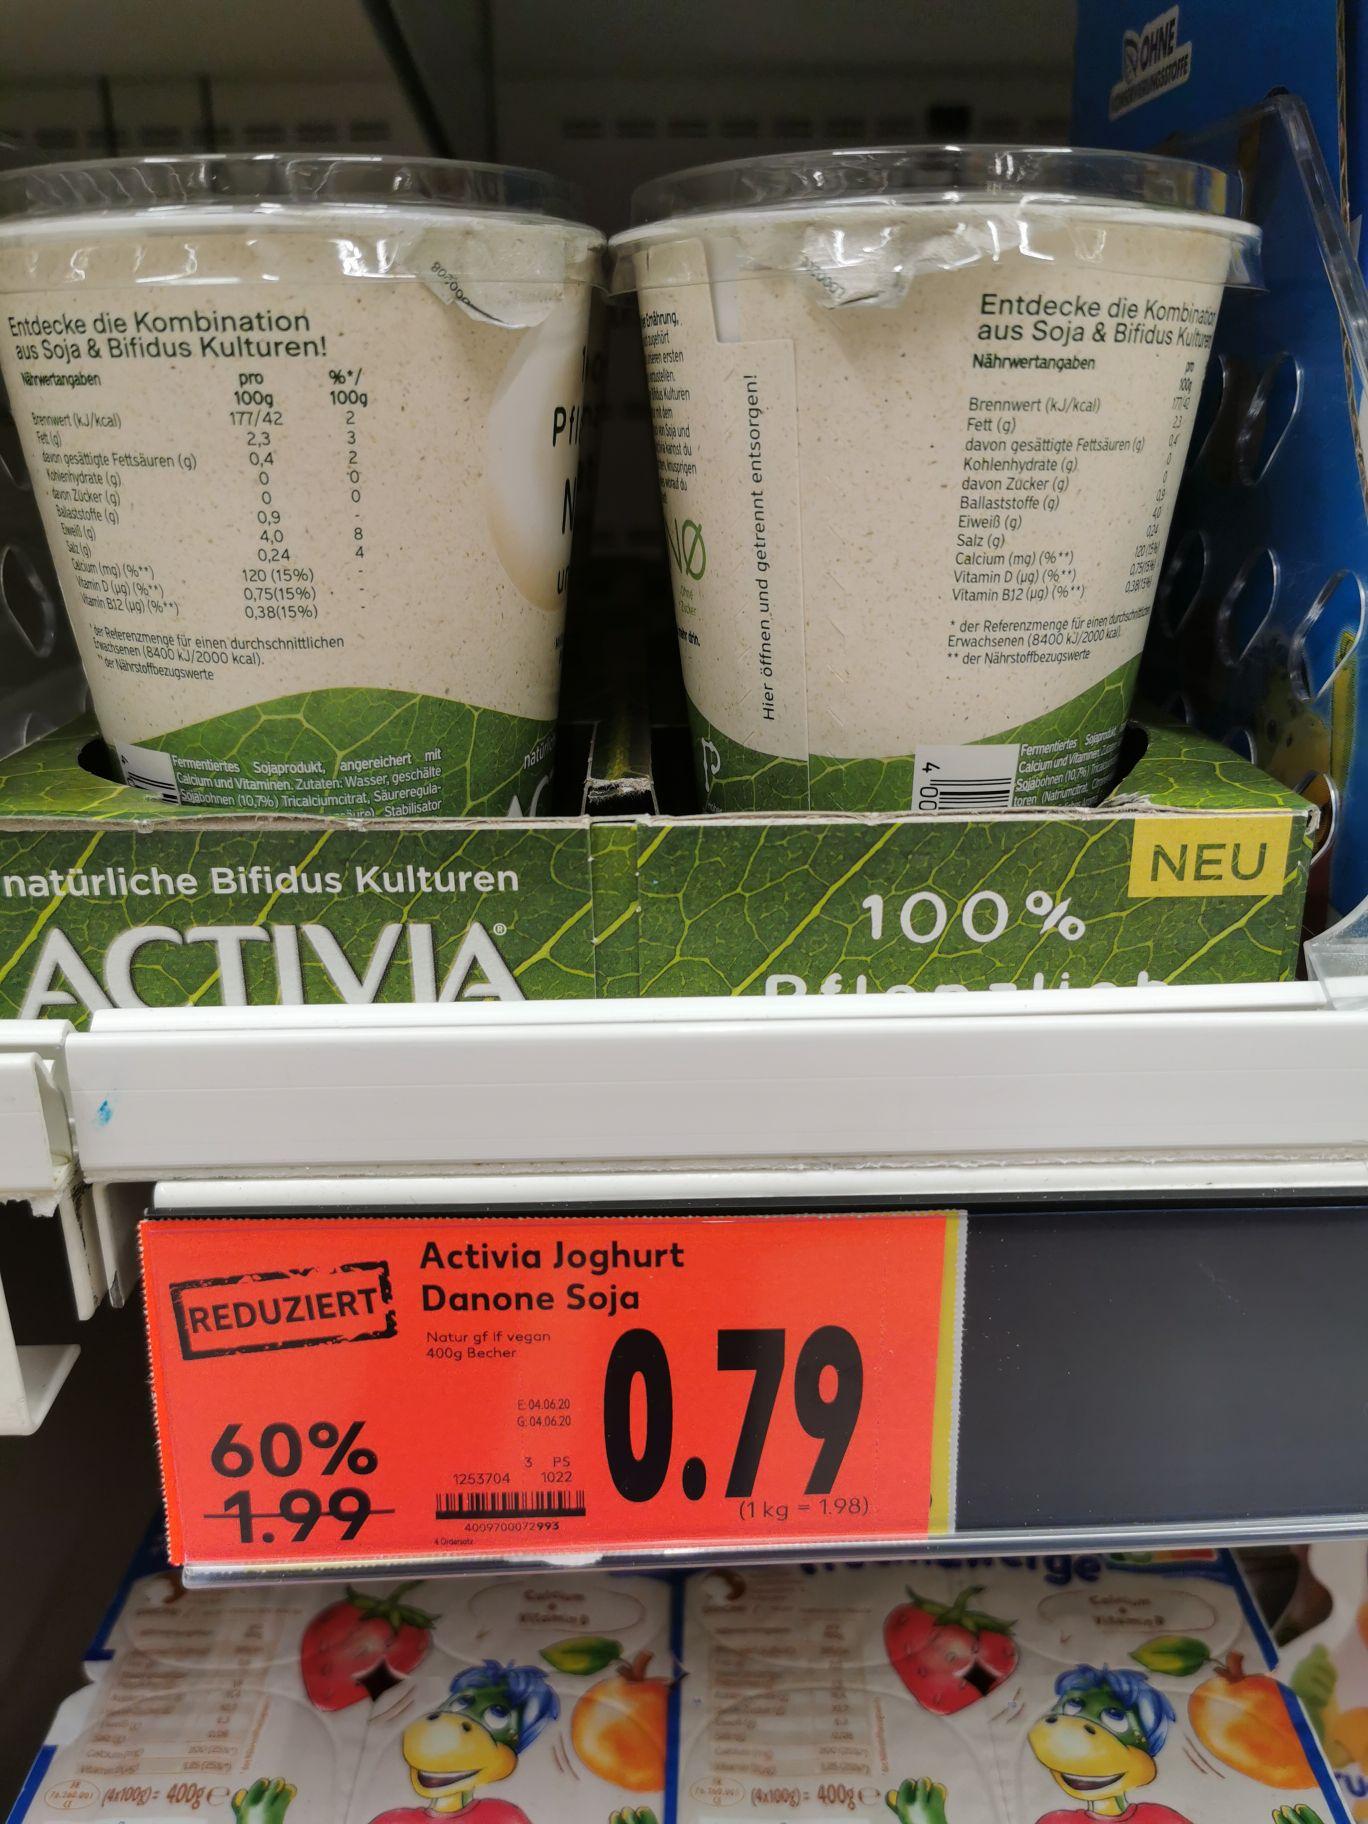 [Lokal Kaufland Kreuztal] 400g Becher Activia Joghurt Danone Soja für 0,79 statt 1,99